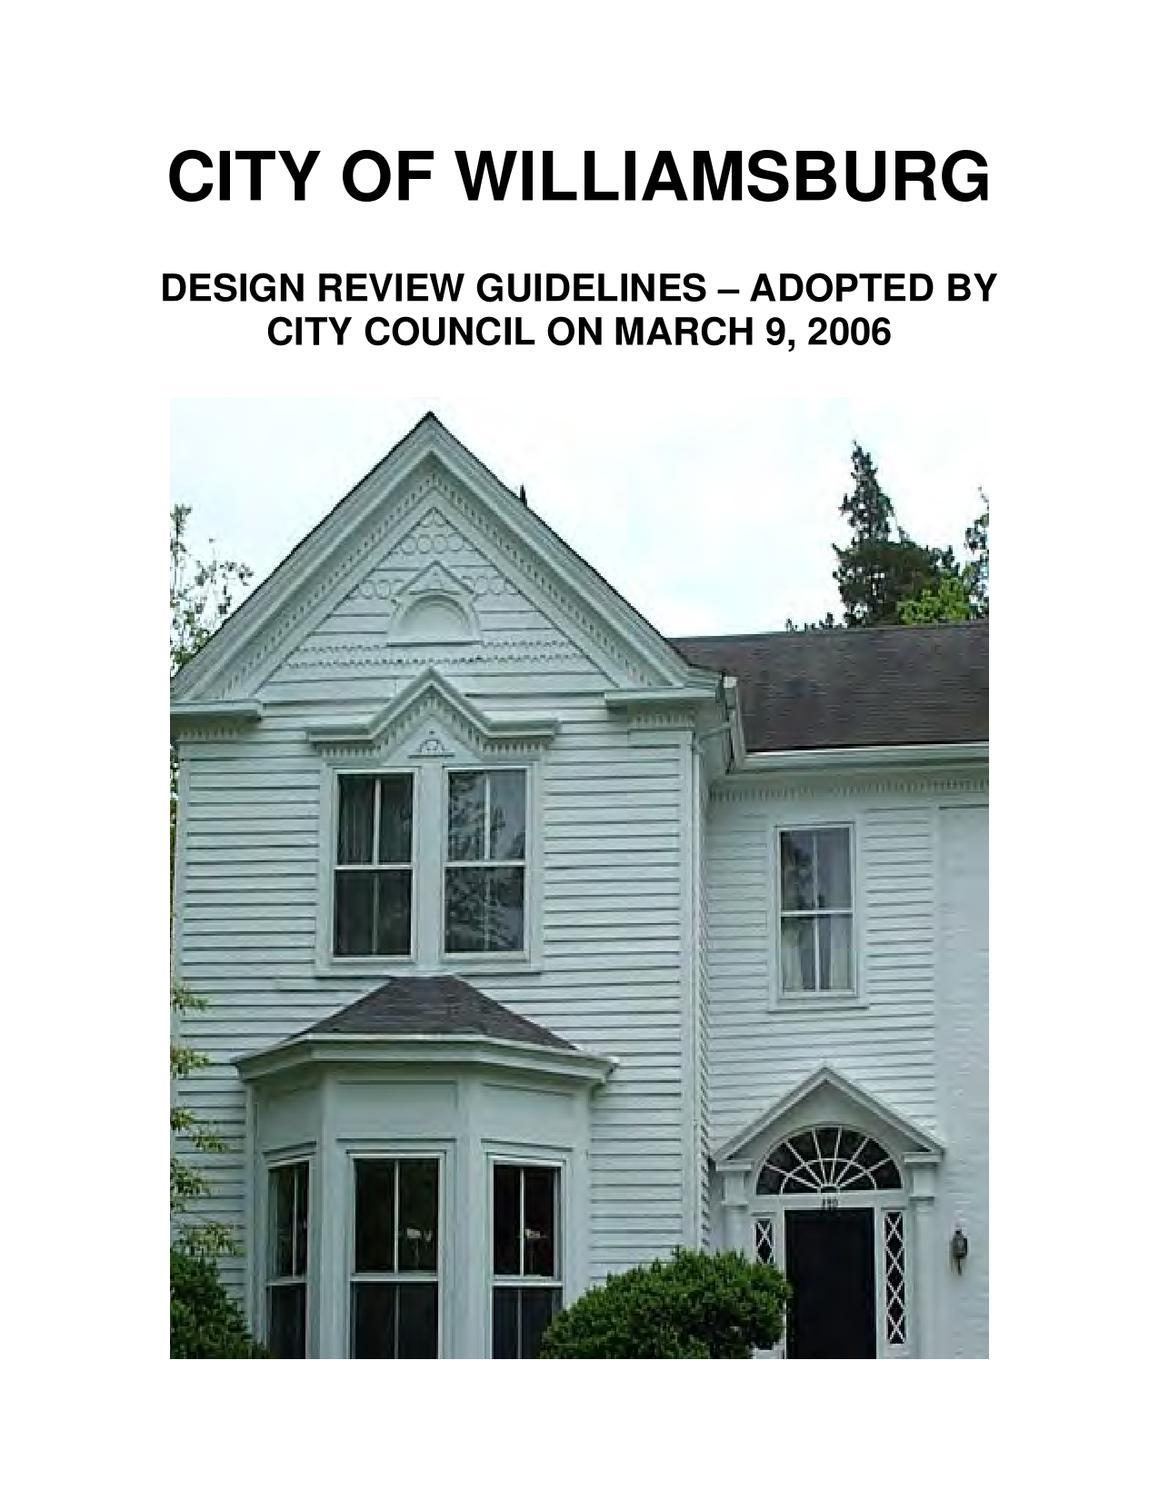 Williamsburg architectural design review guidelines by for Architectural design review